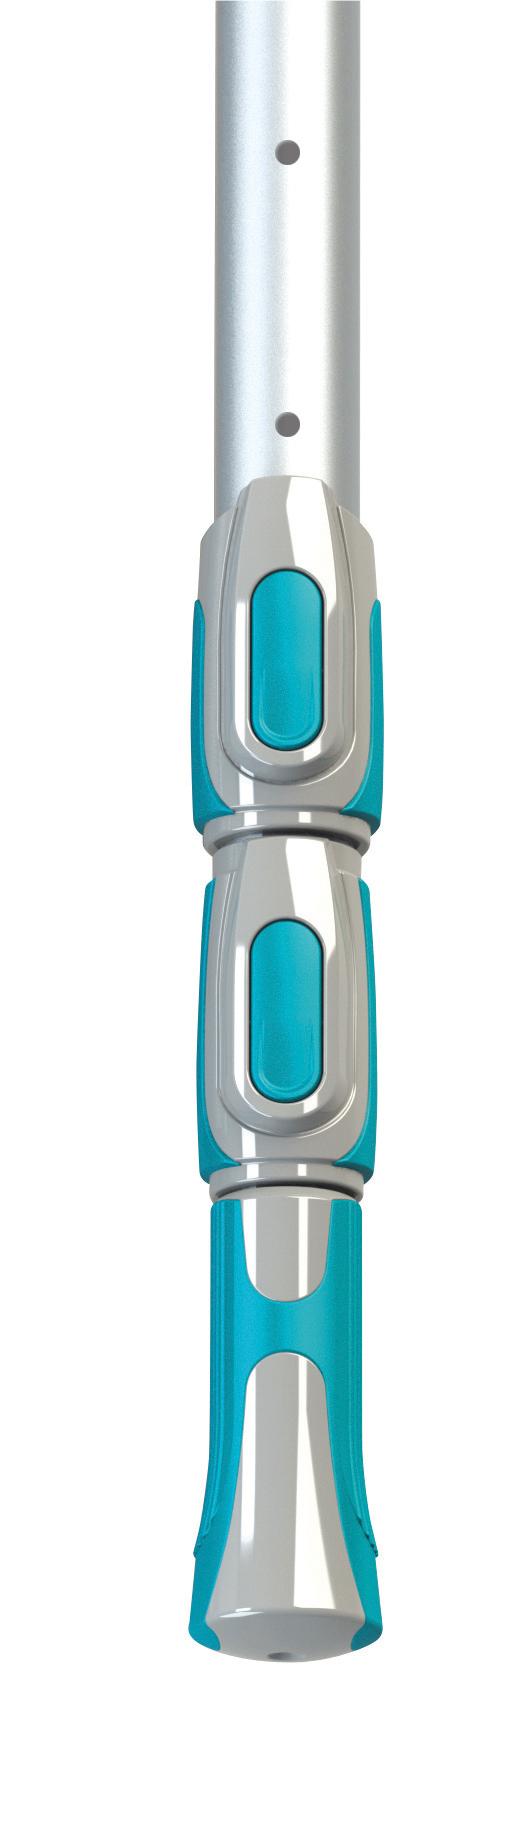 BAYROL Komfort Aluminium Teleskopstange